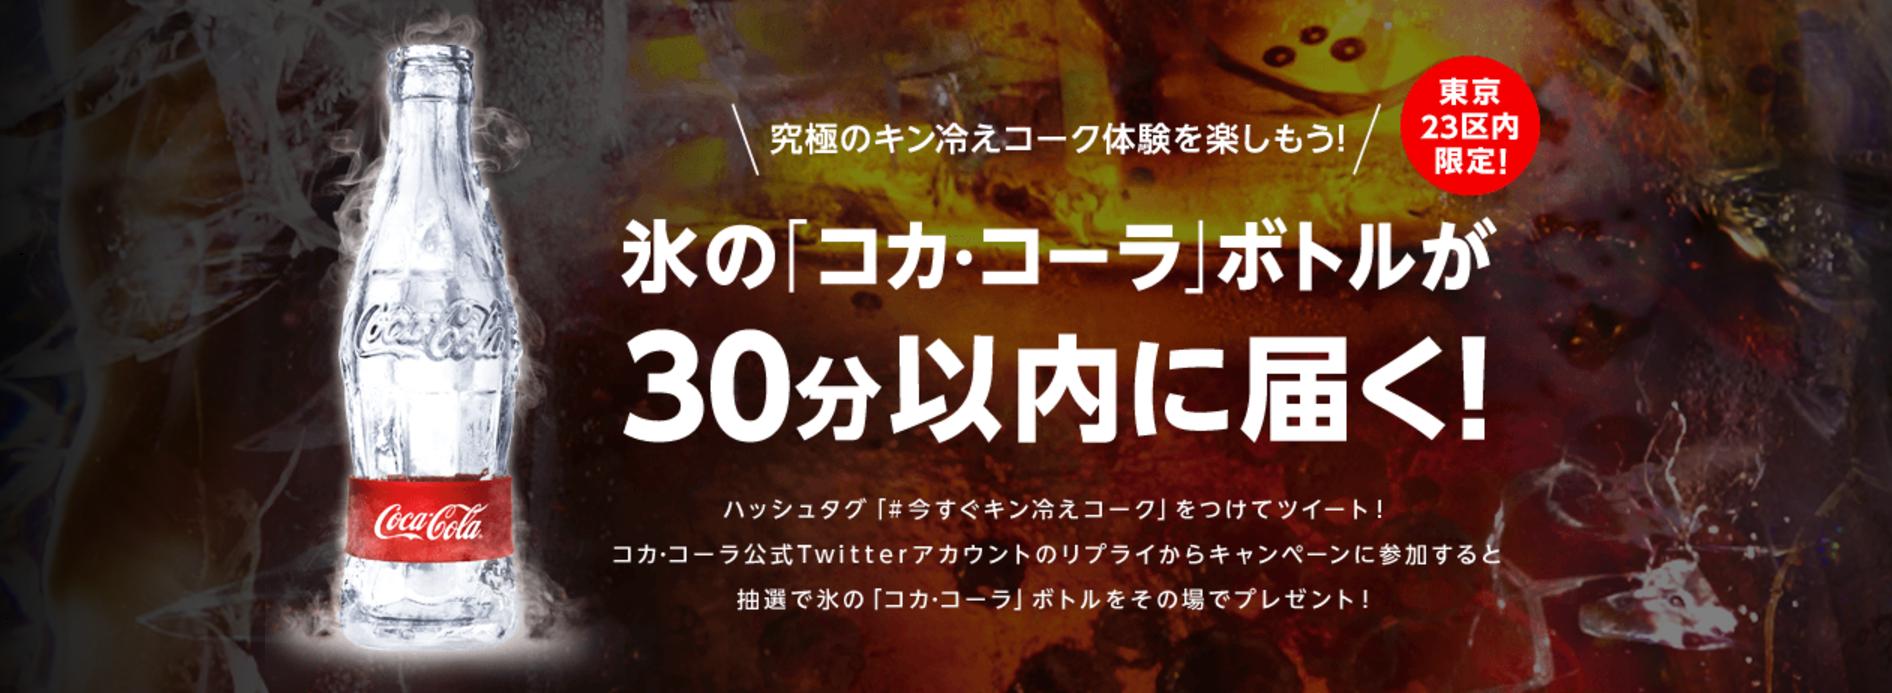 Twitterキャンペーン事例コカ・コーラ